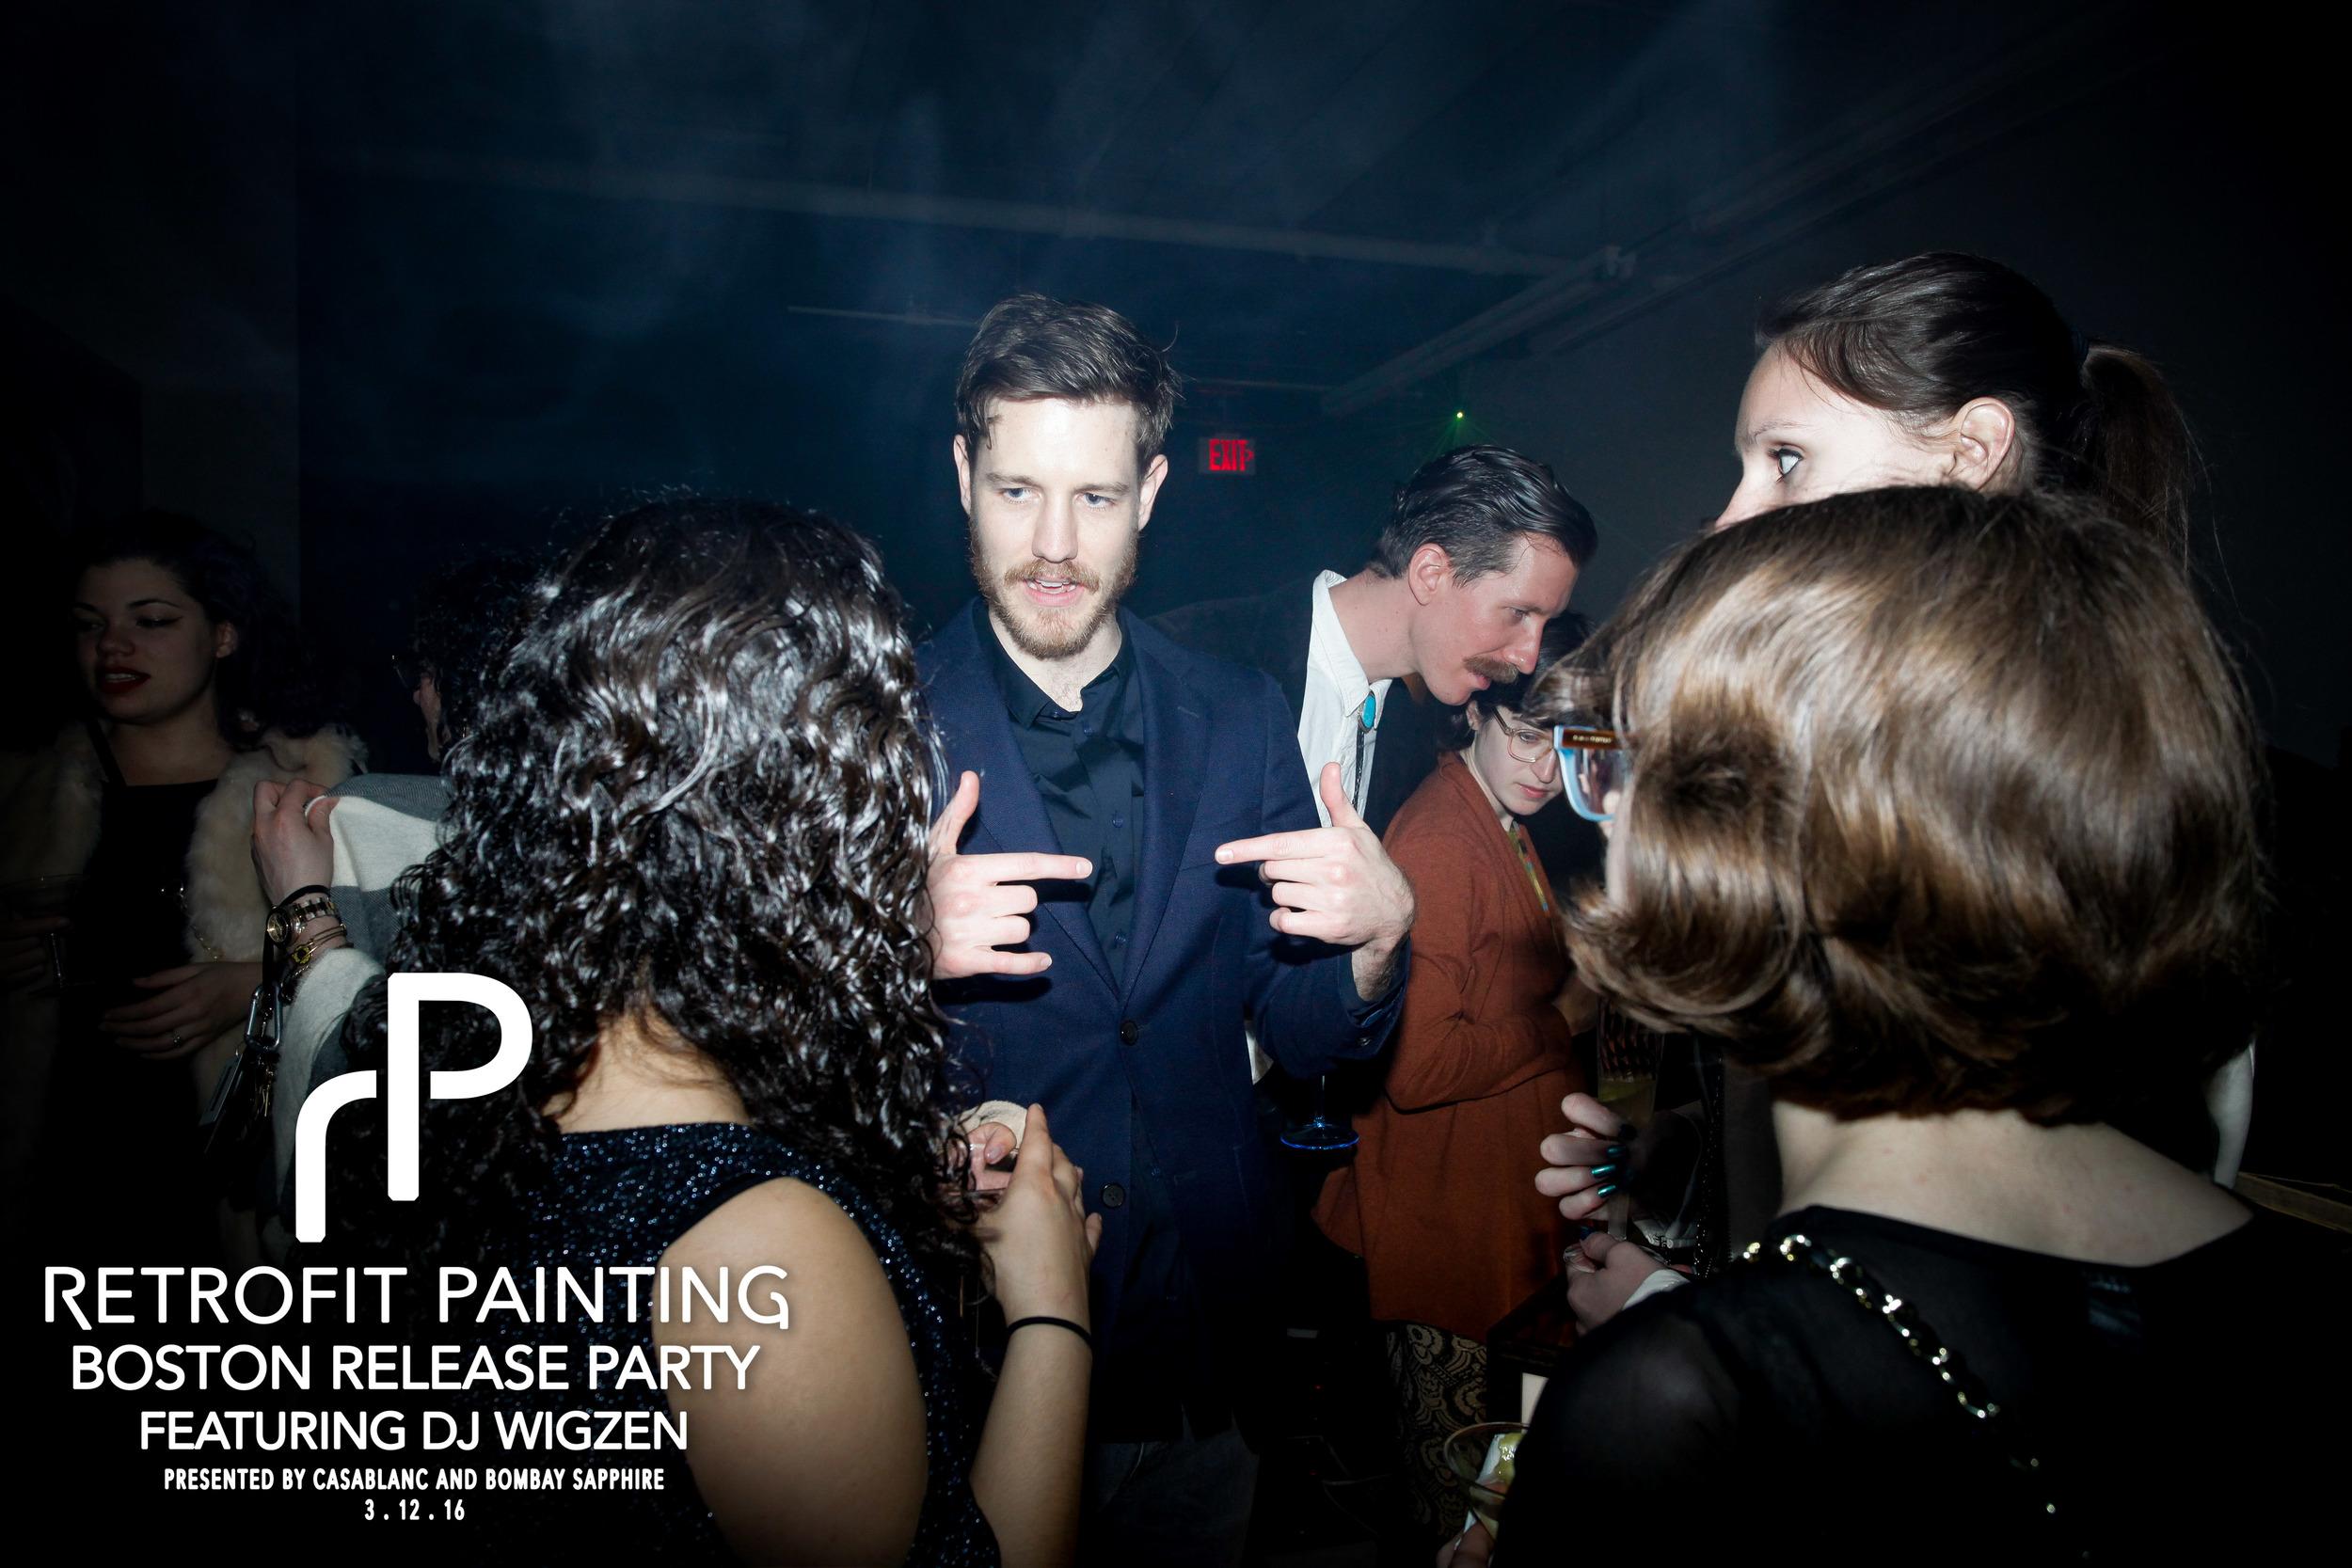 Retrofit Painting Boston Release Party 0027.jpg